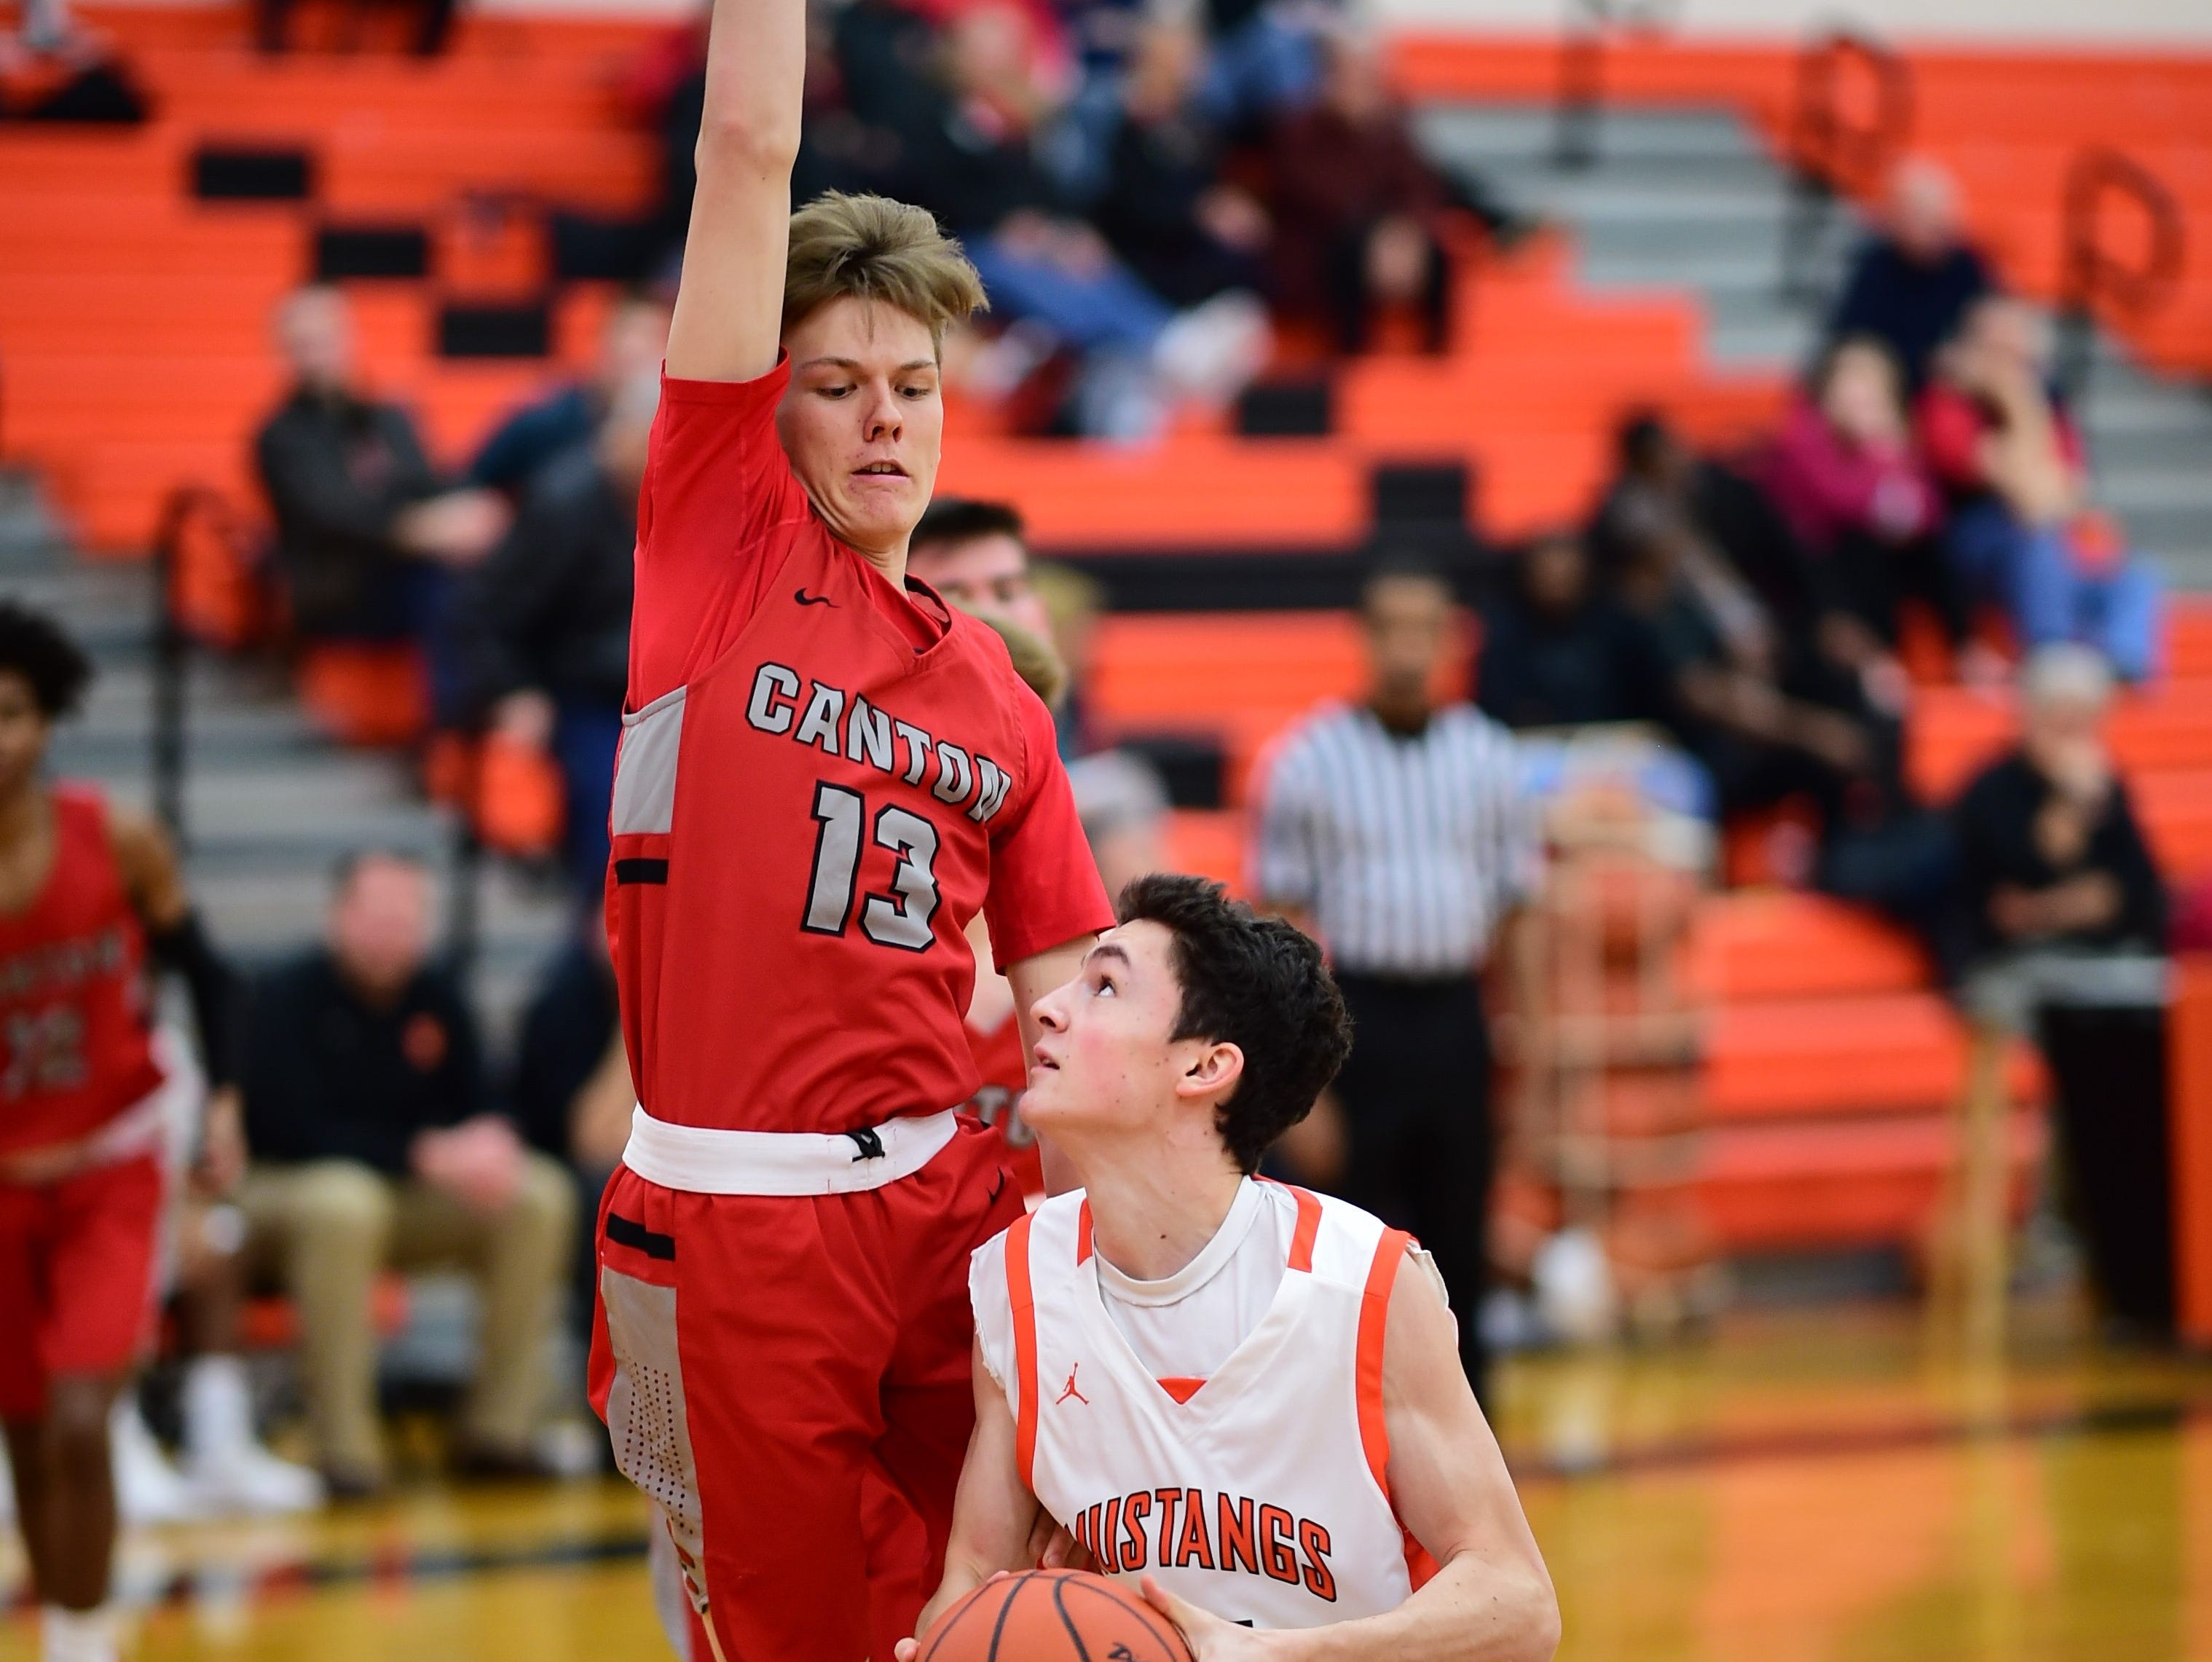 Canton's Jacob Rubis (13) defends against Northville's Max Barnes.